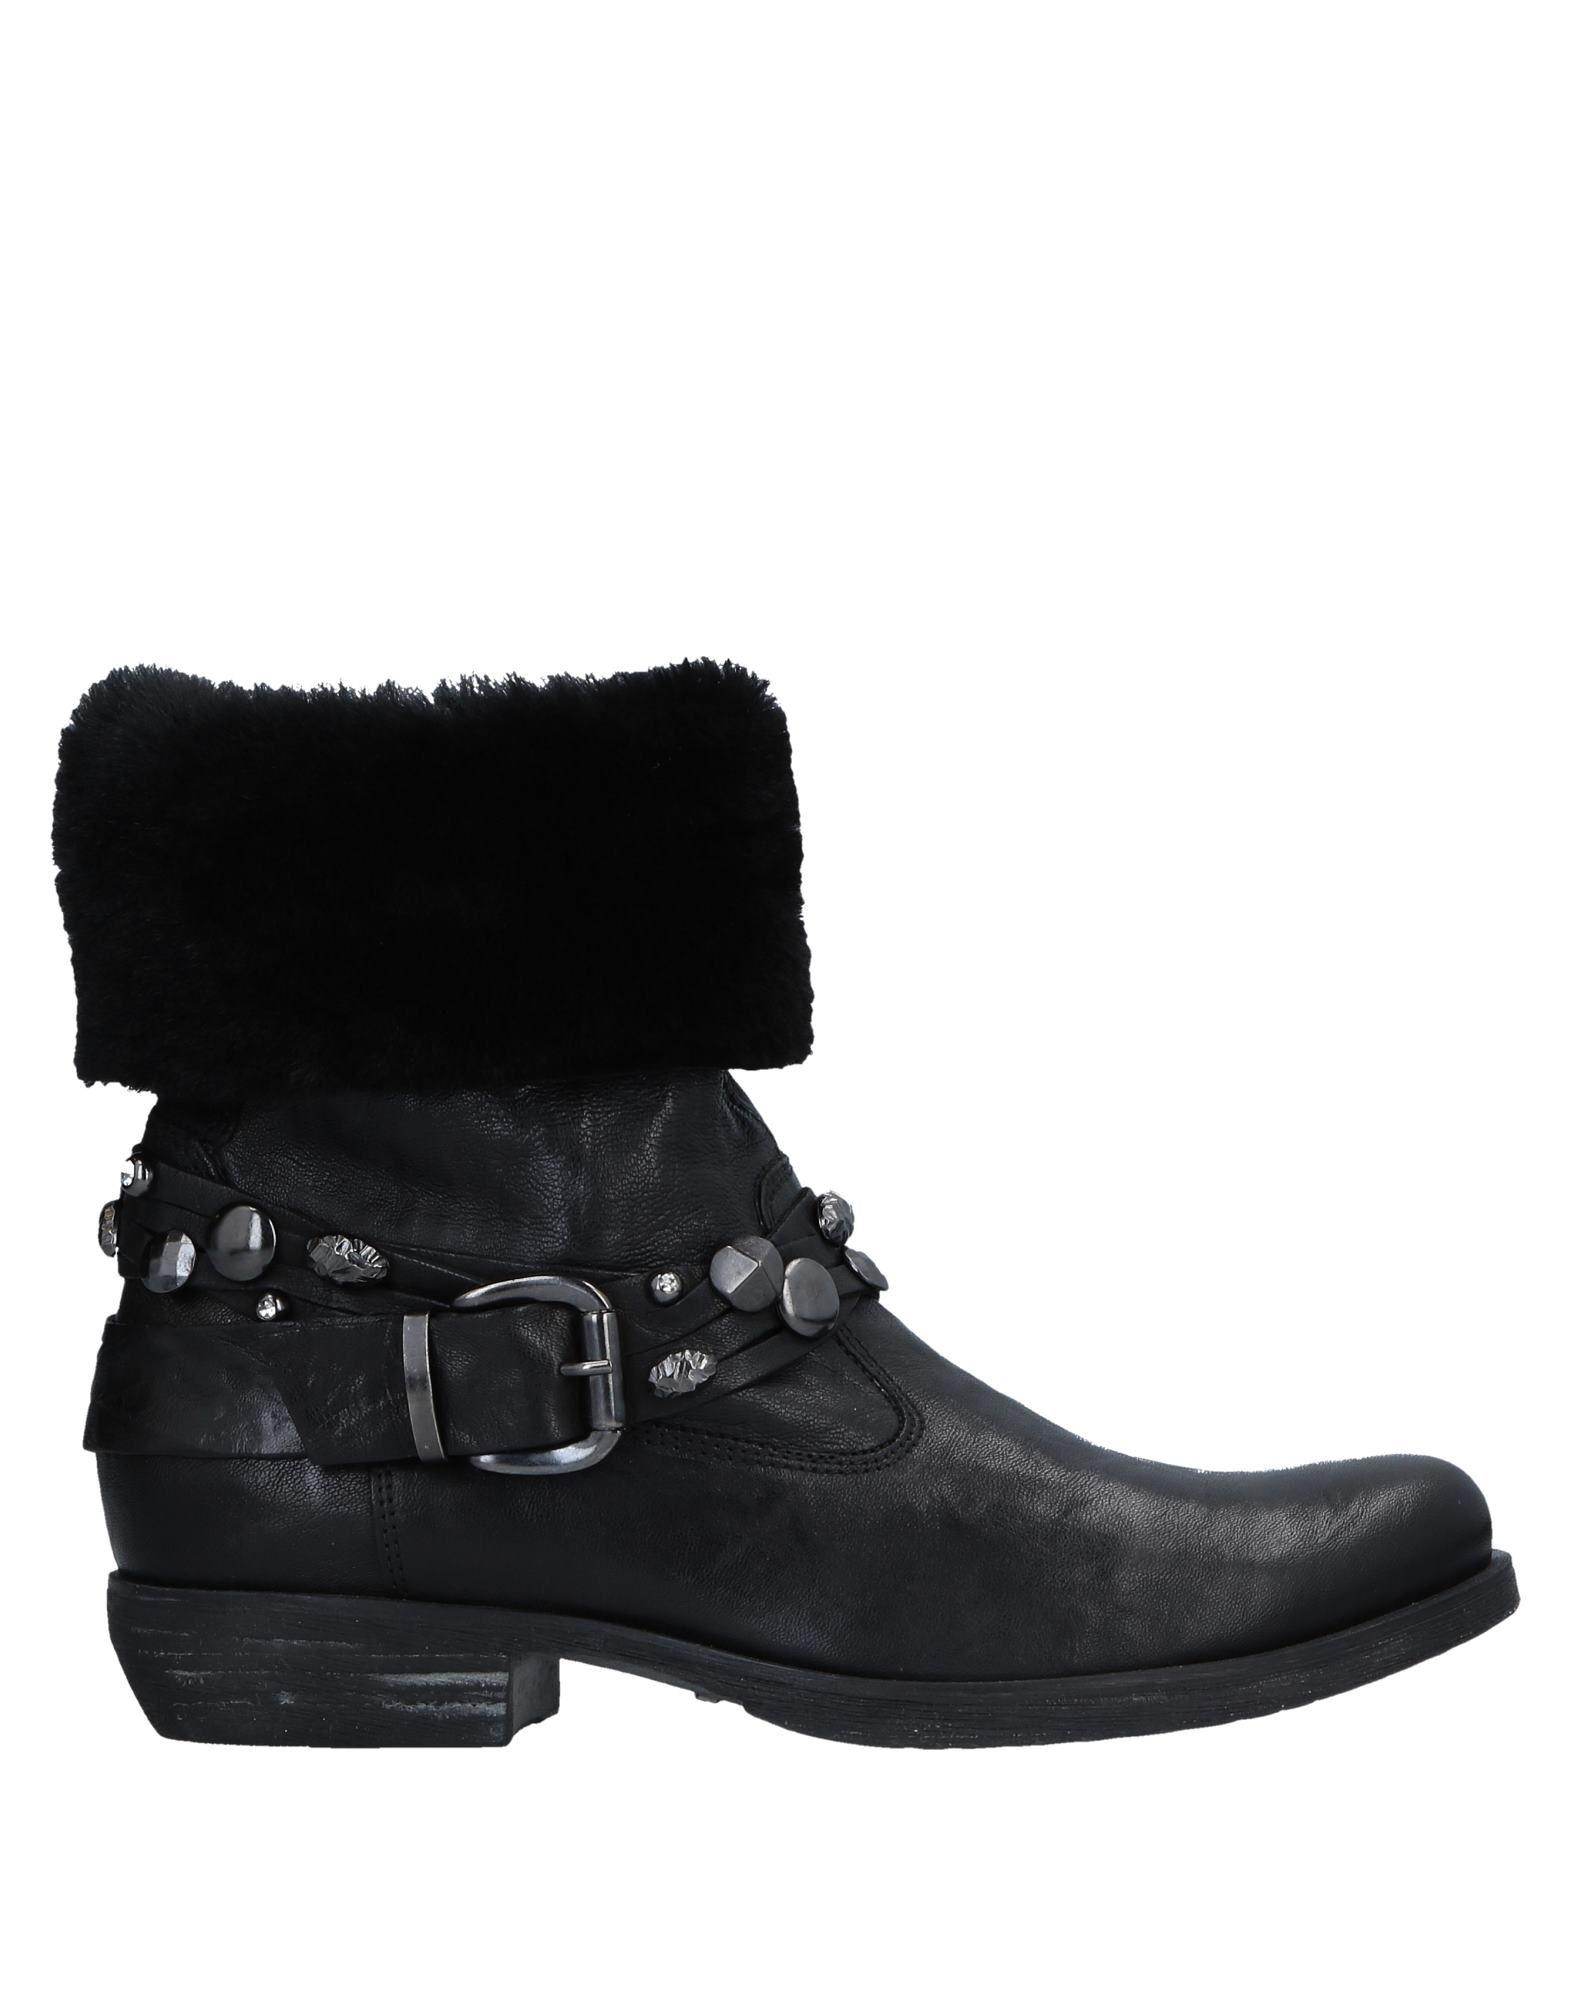 Nero Giardini Stiefelette Damen    11539409OS Gute Qualität beliebte Schuhe 58d894